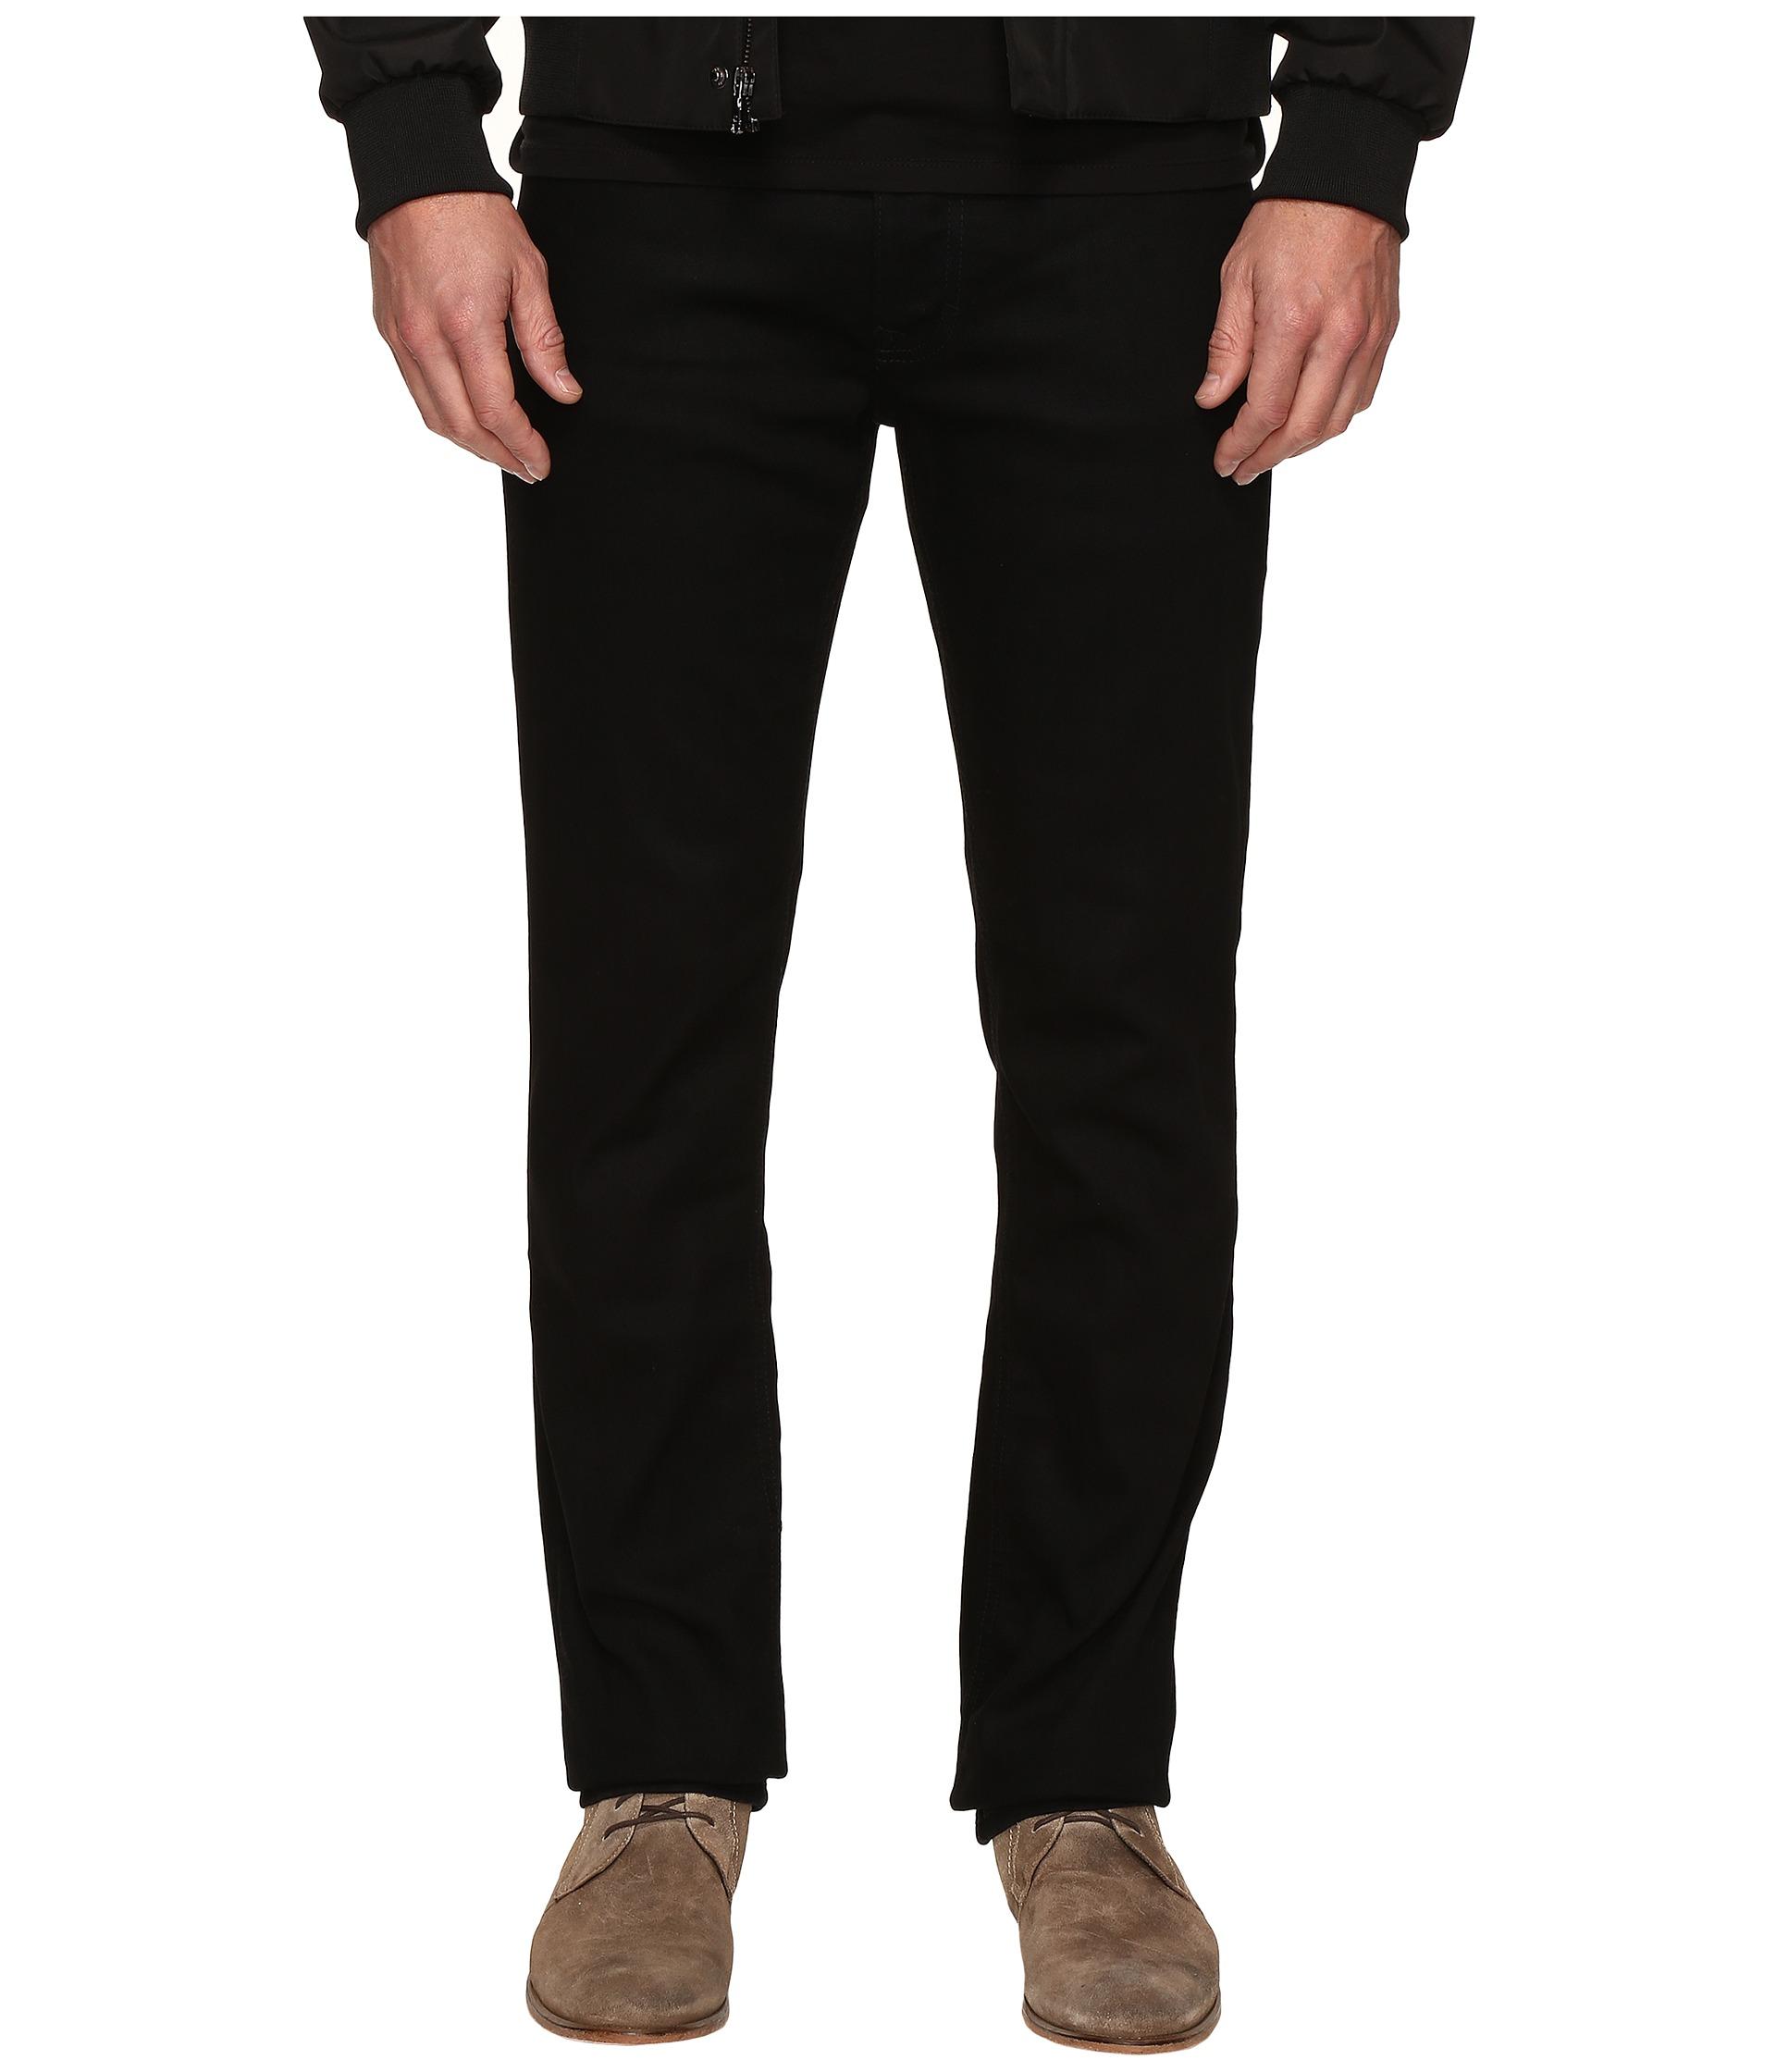 calvin klein jeans slim straight jeans in clean black wash. Black Bedroom Furniture Sets. Home Design Ideas